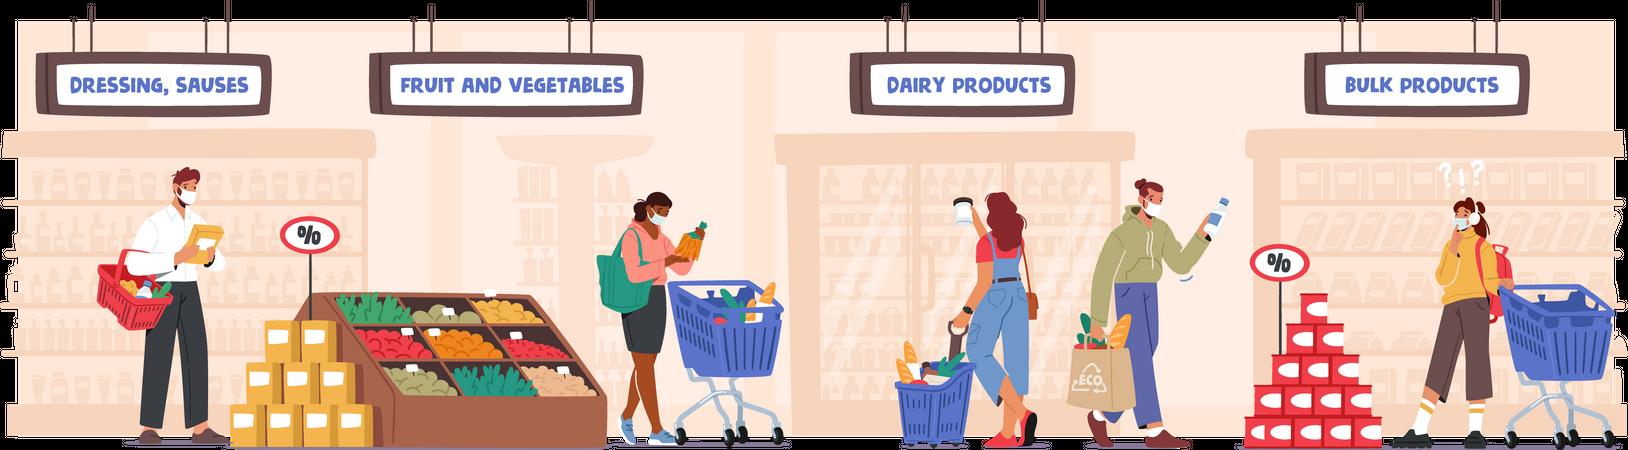 People wearing mask shopping at supermarket buying products Illustration